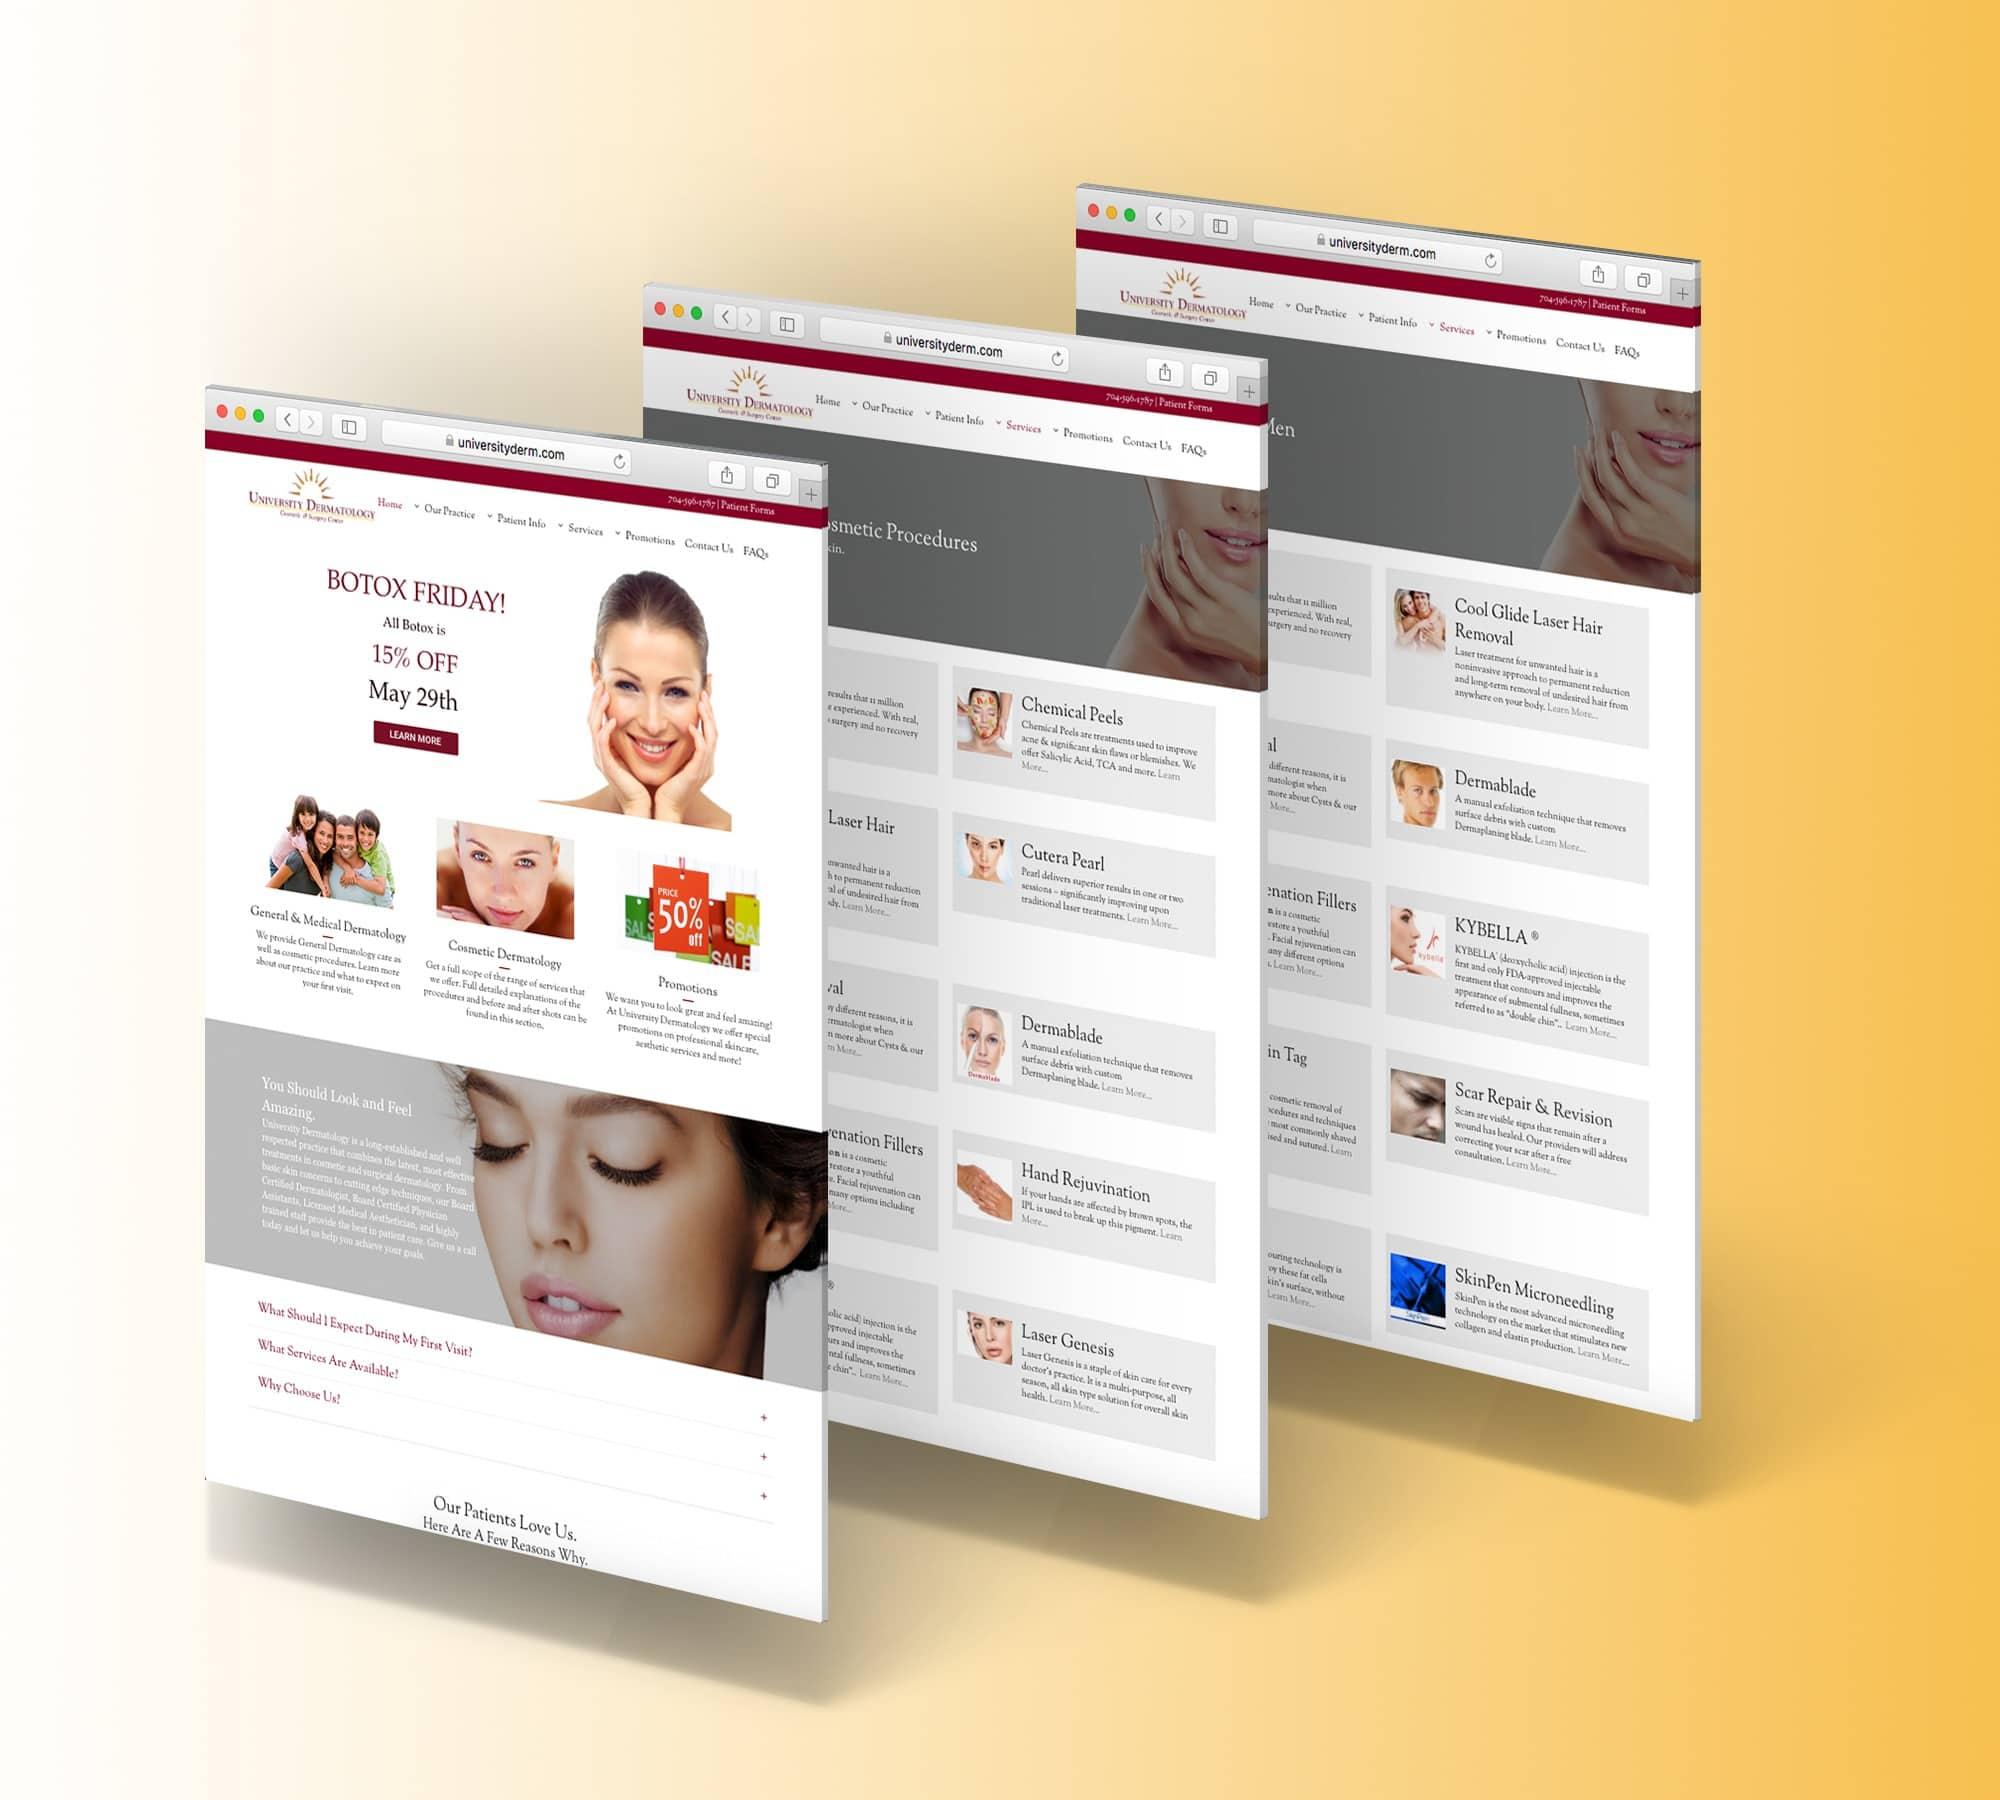 University Dermatology Web Display